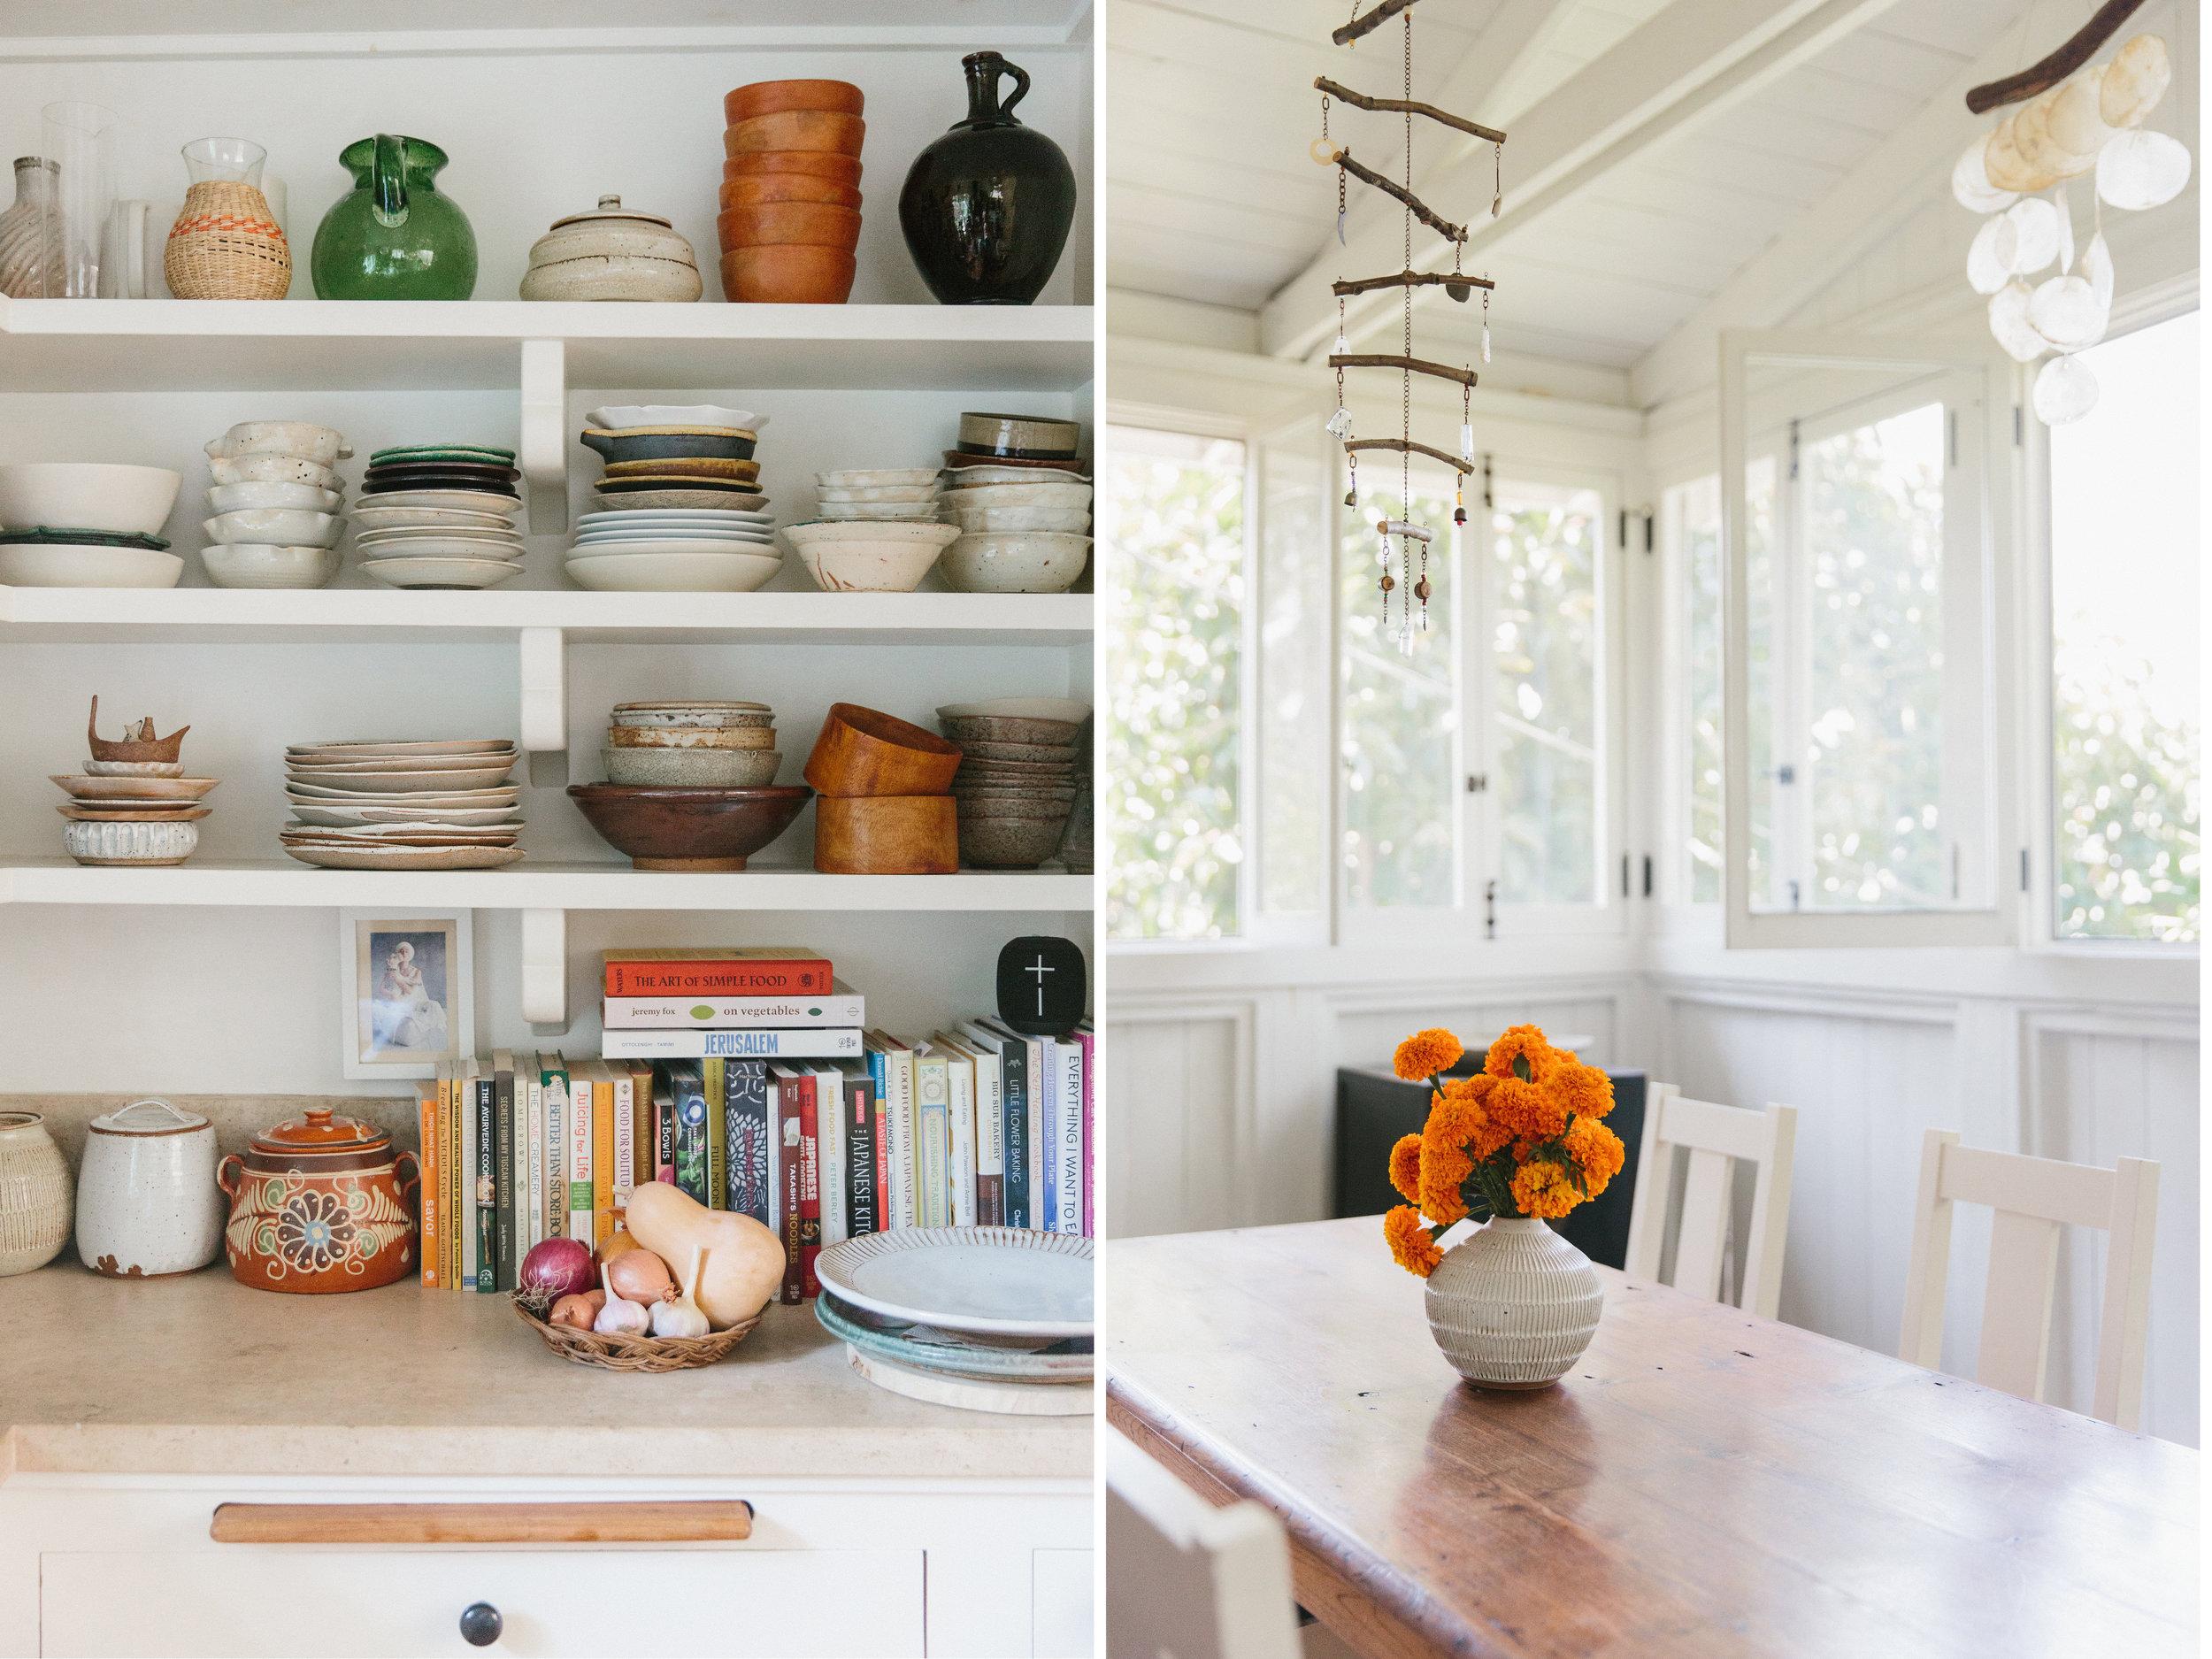 mt-washington-pottery_jenni-kayne_los-angeles-editorial-studio-home-tour_nicki-sebastian_3.jpg